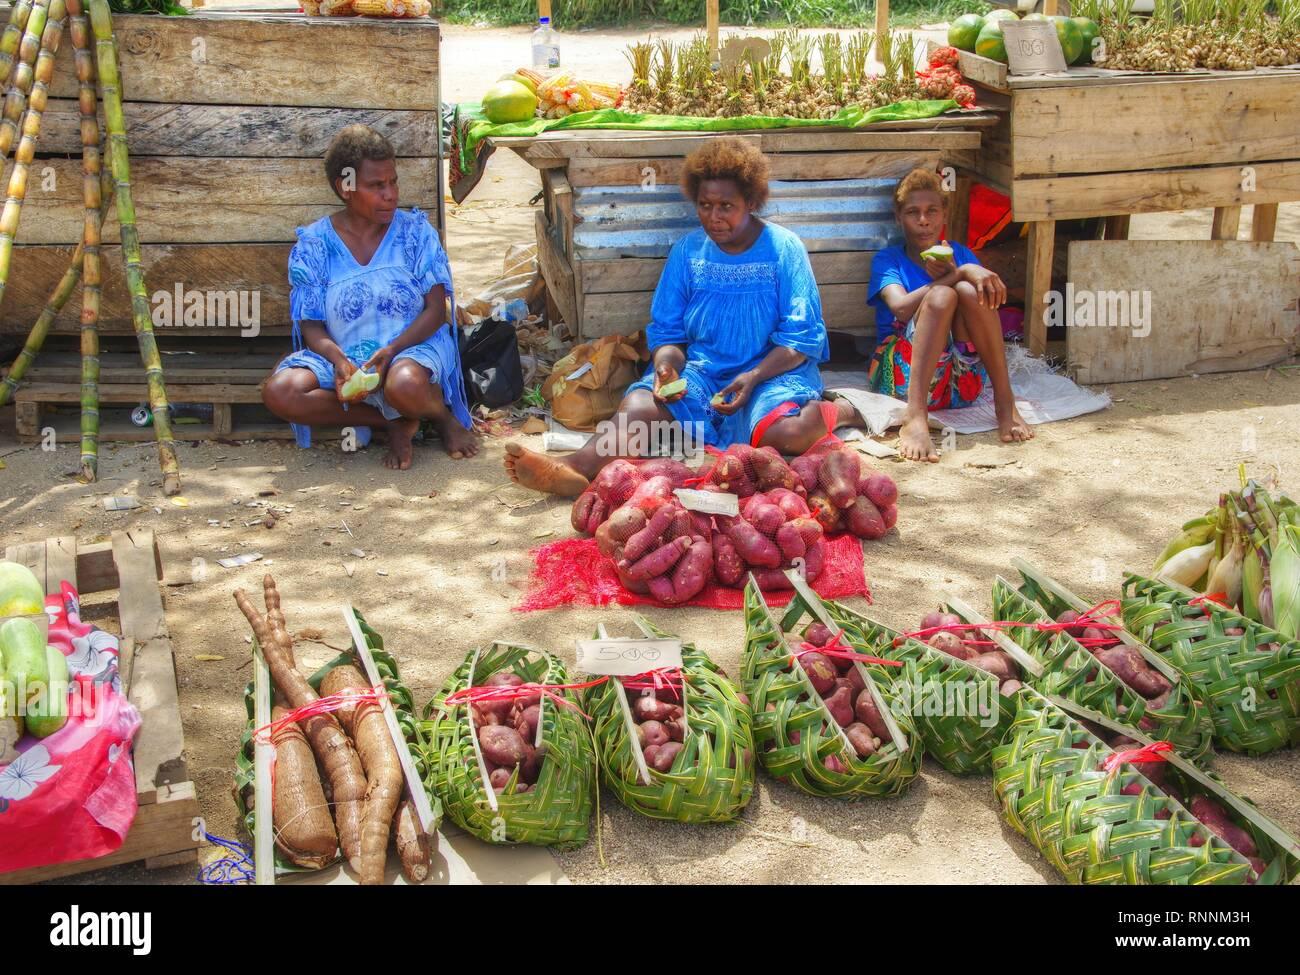 Road Side Market Port Vila Vanuatu - Stock Image